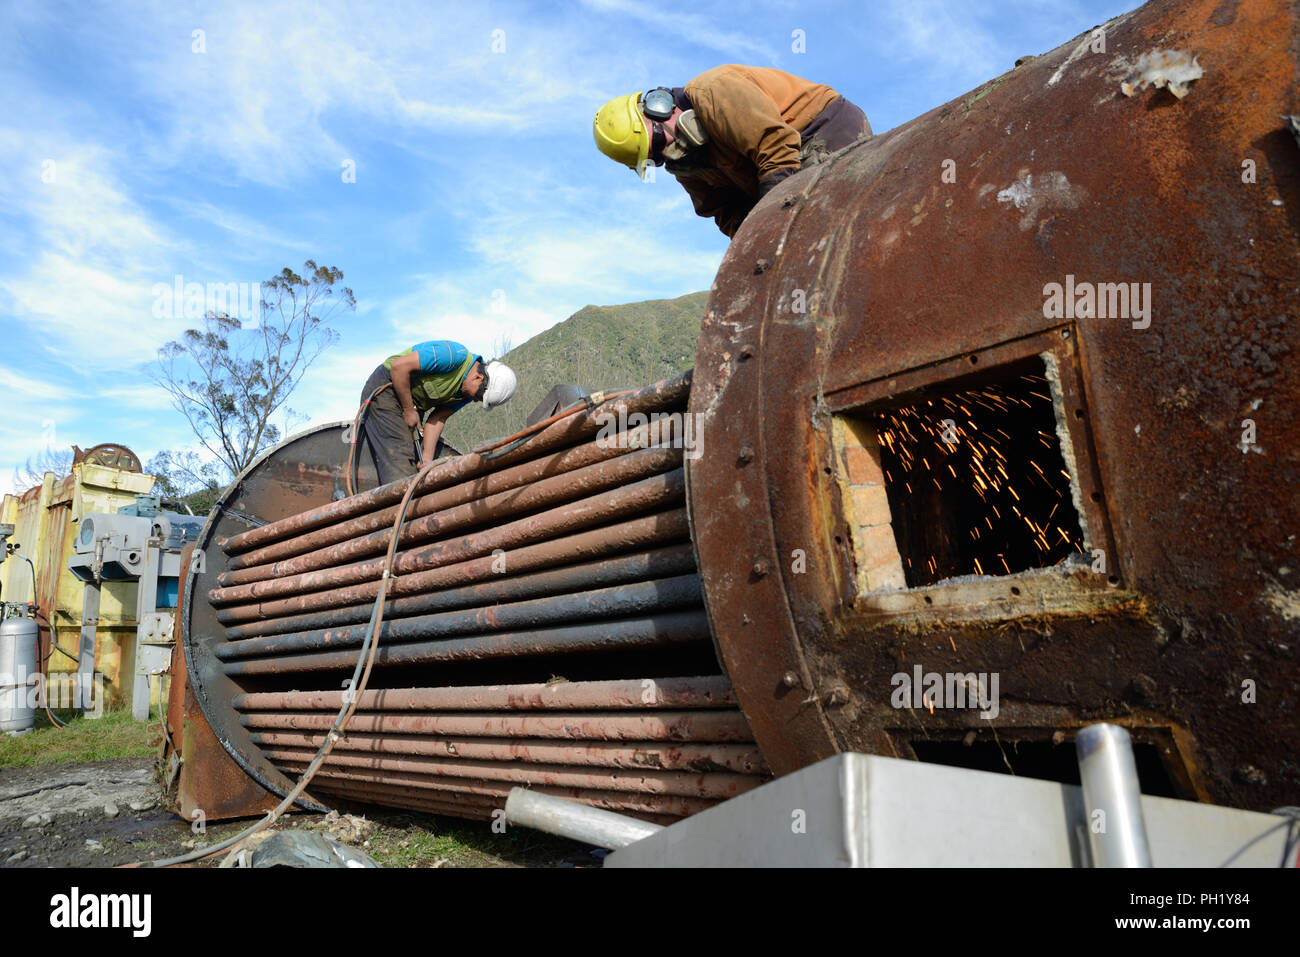 Oxy Gas Stock Photos & Oxy Gas Stock Images - Alamy